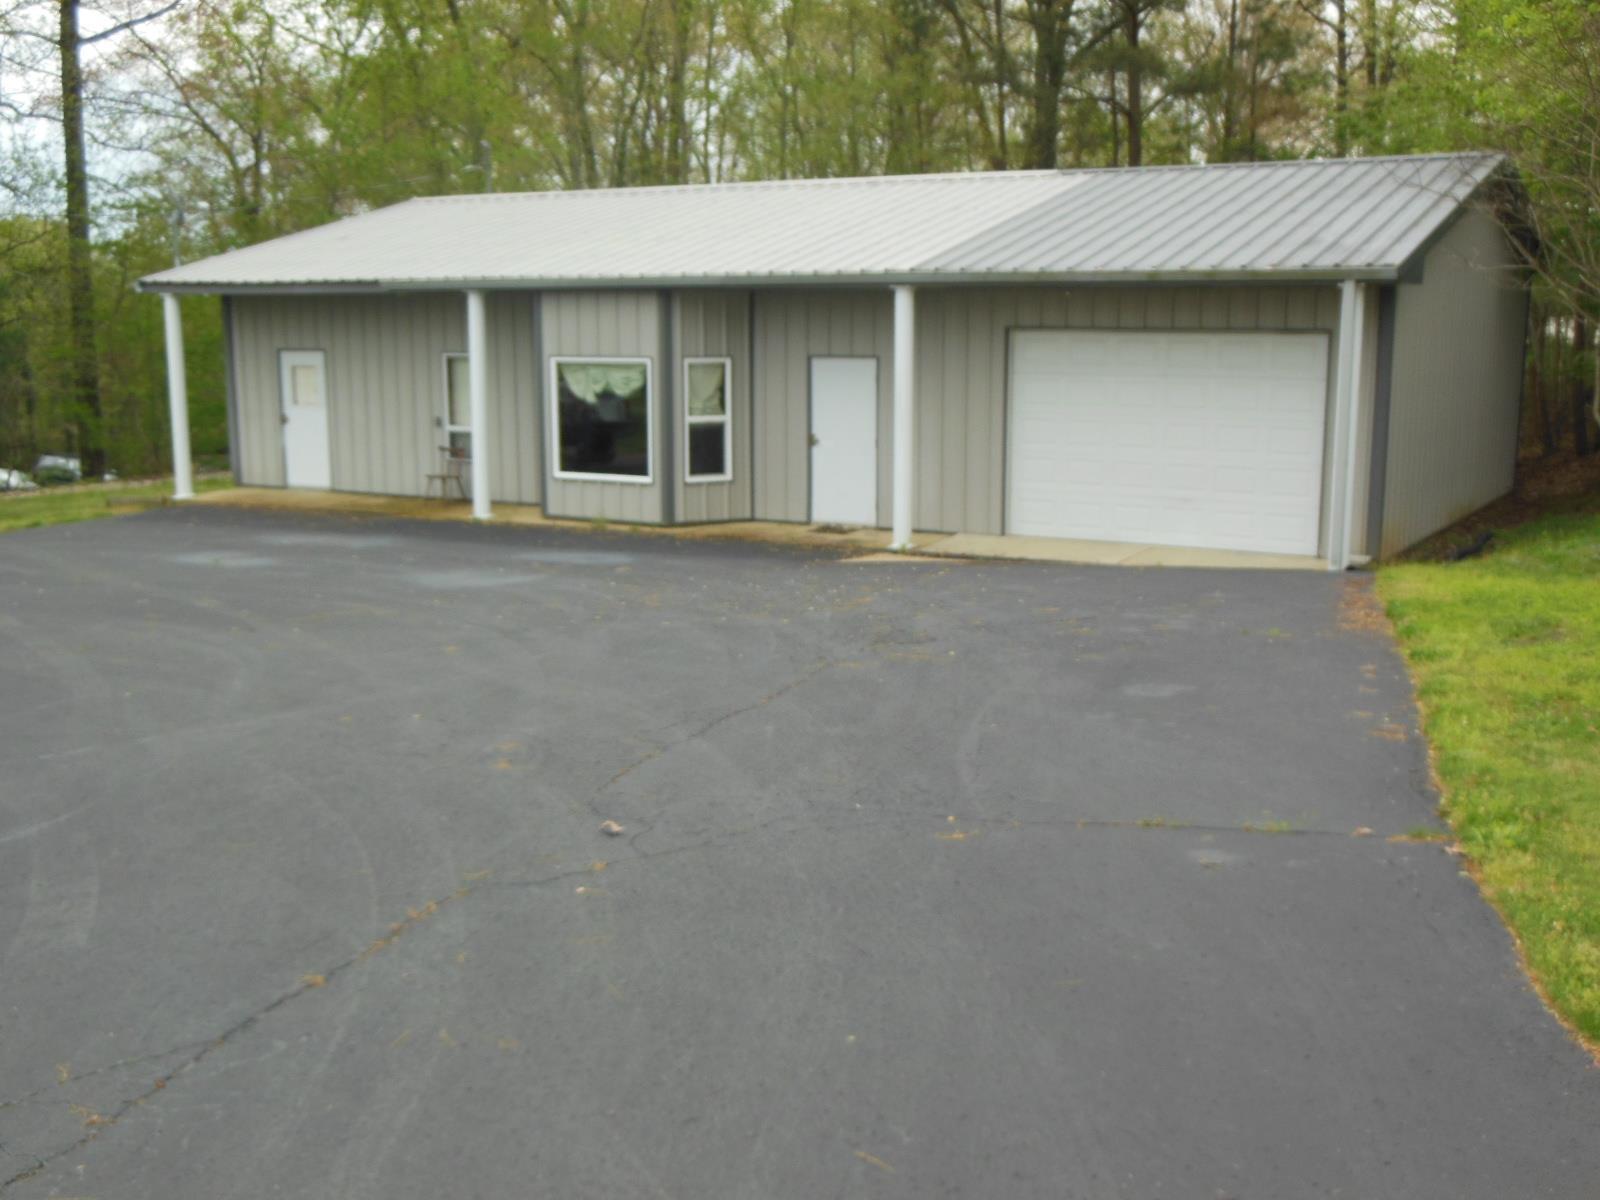 5325 E Antioch Rd, Springville, TN 38256 - Springville, TN real estate listing